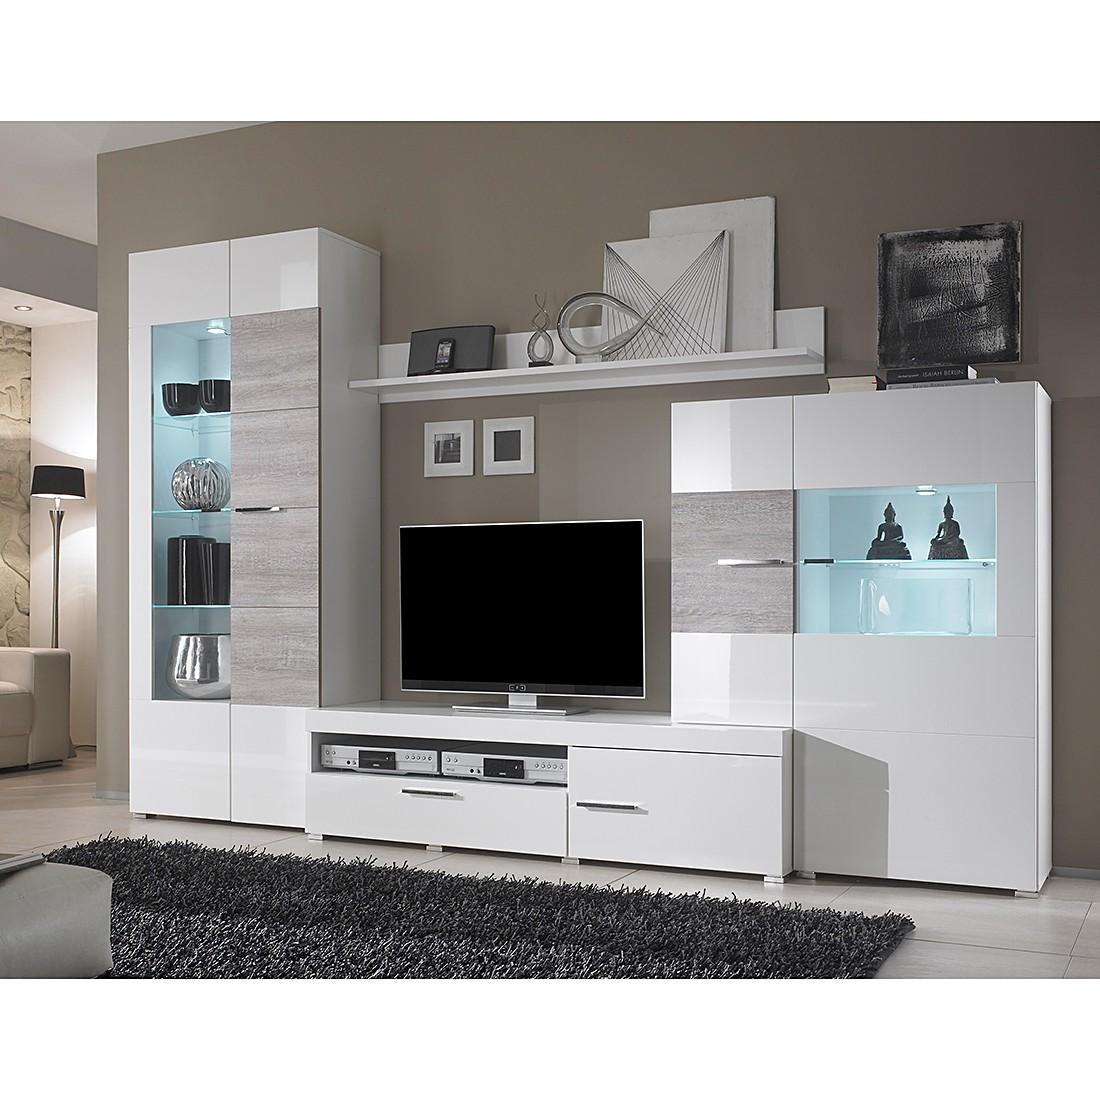 wohnwand monza 4 tlg inkl beleuchtung wei hochglanz. Black Bedroom Furniture Sets. Home Design Ideas